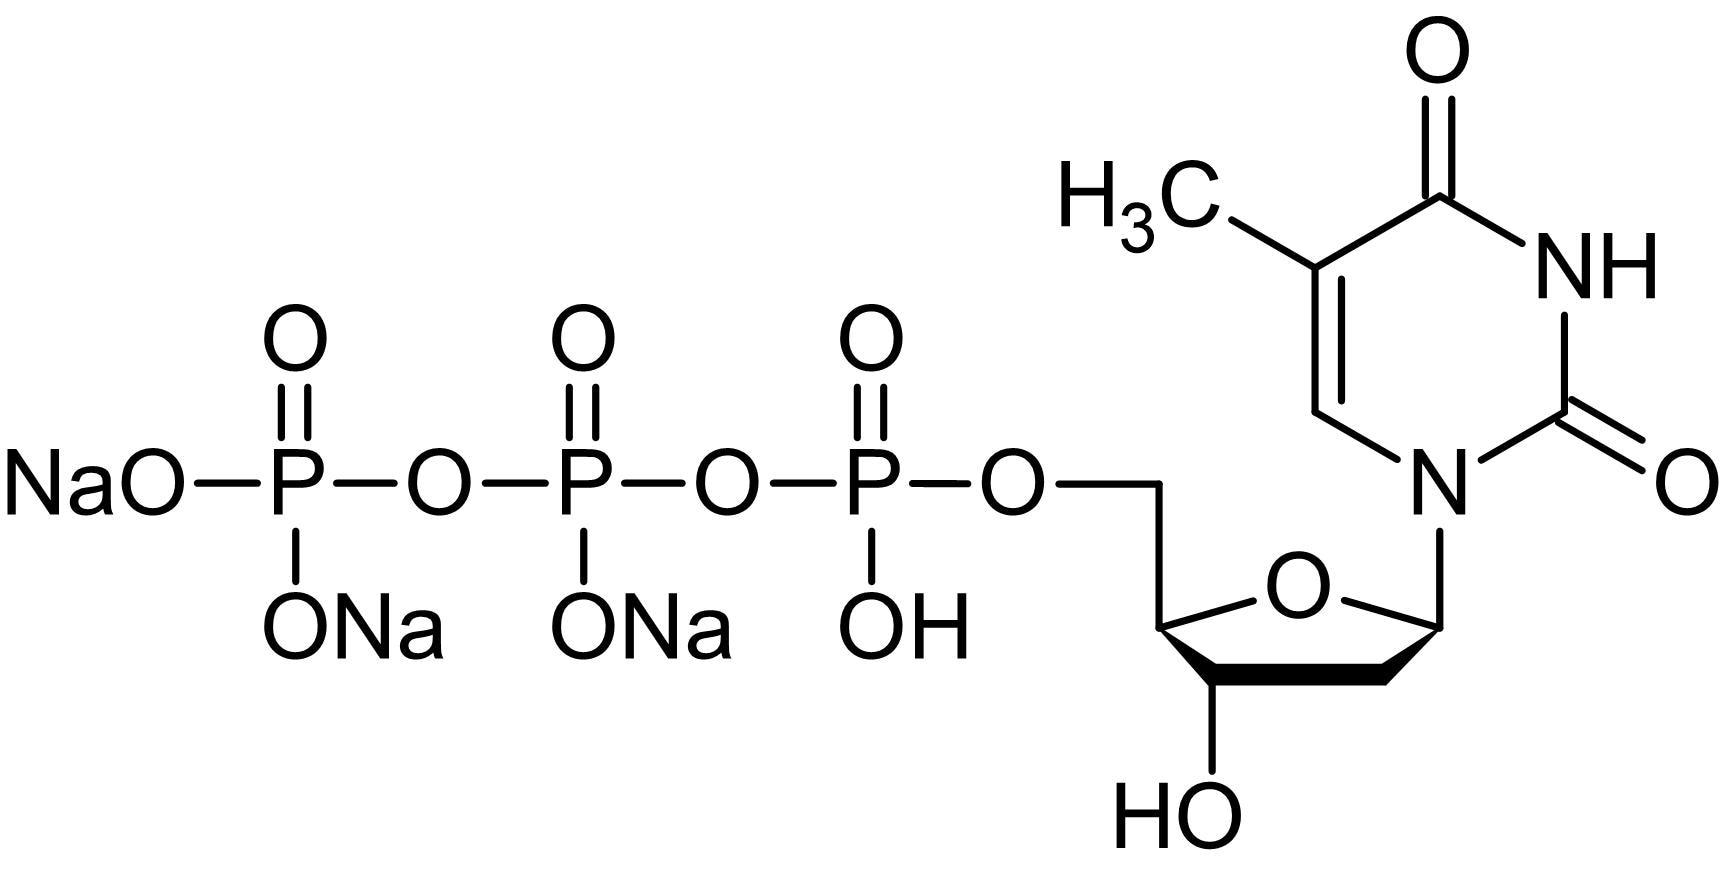 Chemical Structure - 2'-Deoxythymidine 5'-triphosphate [dTTP] trisodium salt (aqueous), nucleoside triphosphate (ab146558)